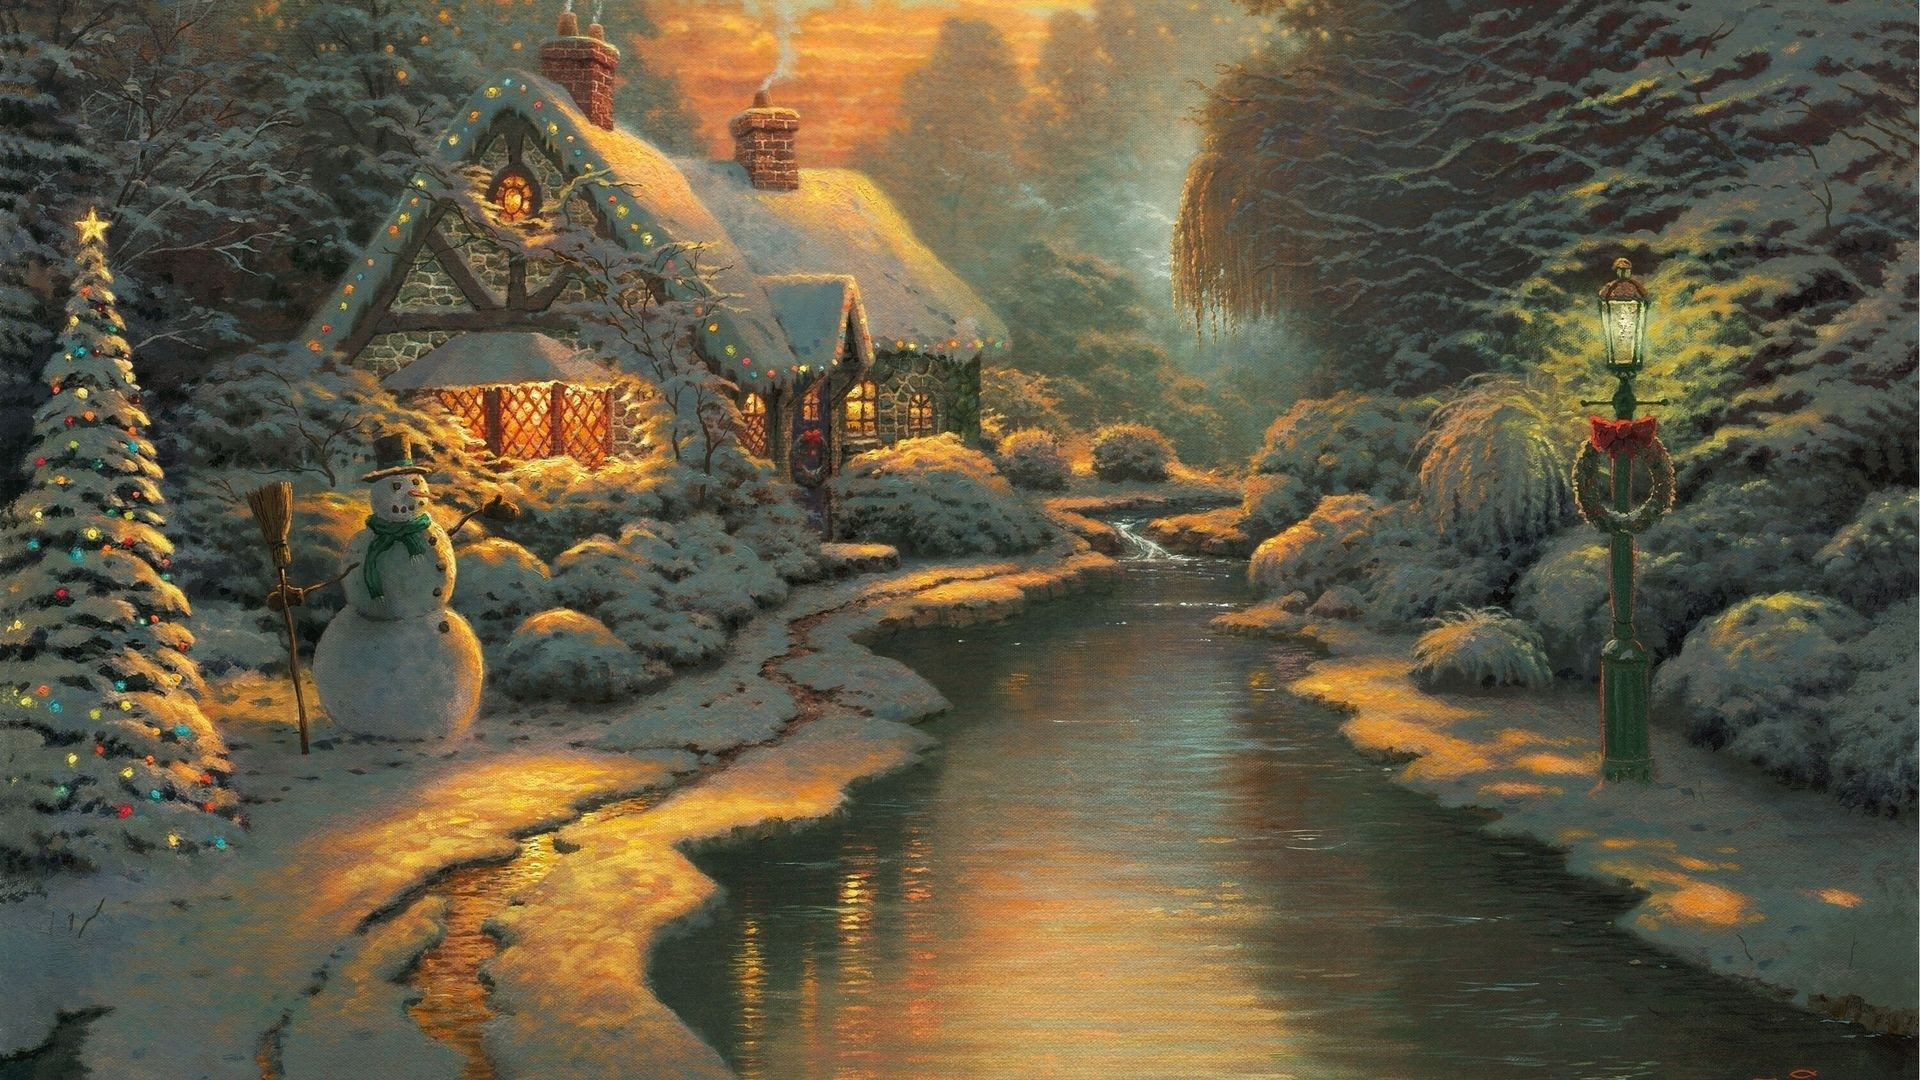 Thomas Kinkade Winter Wallpaper Sf Wallpaper